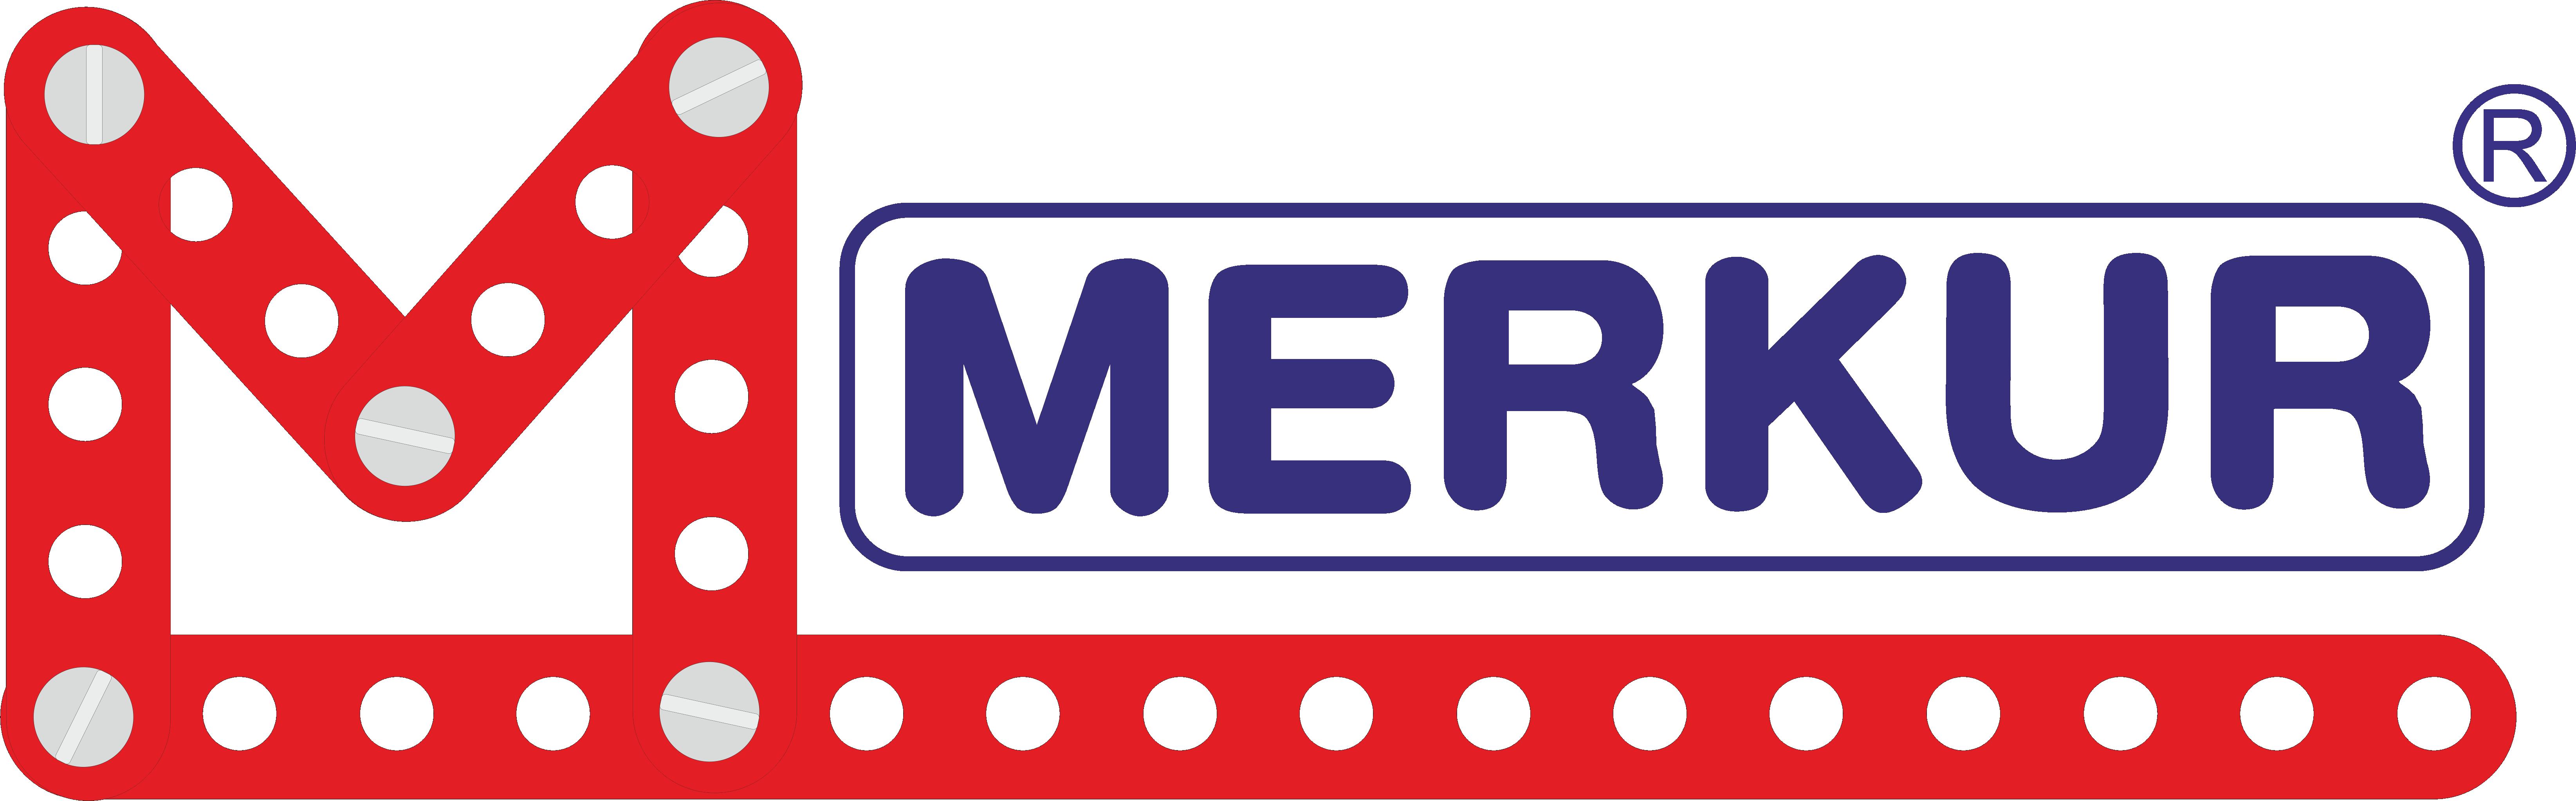 hs-t-logo